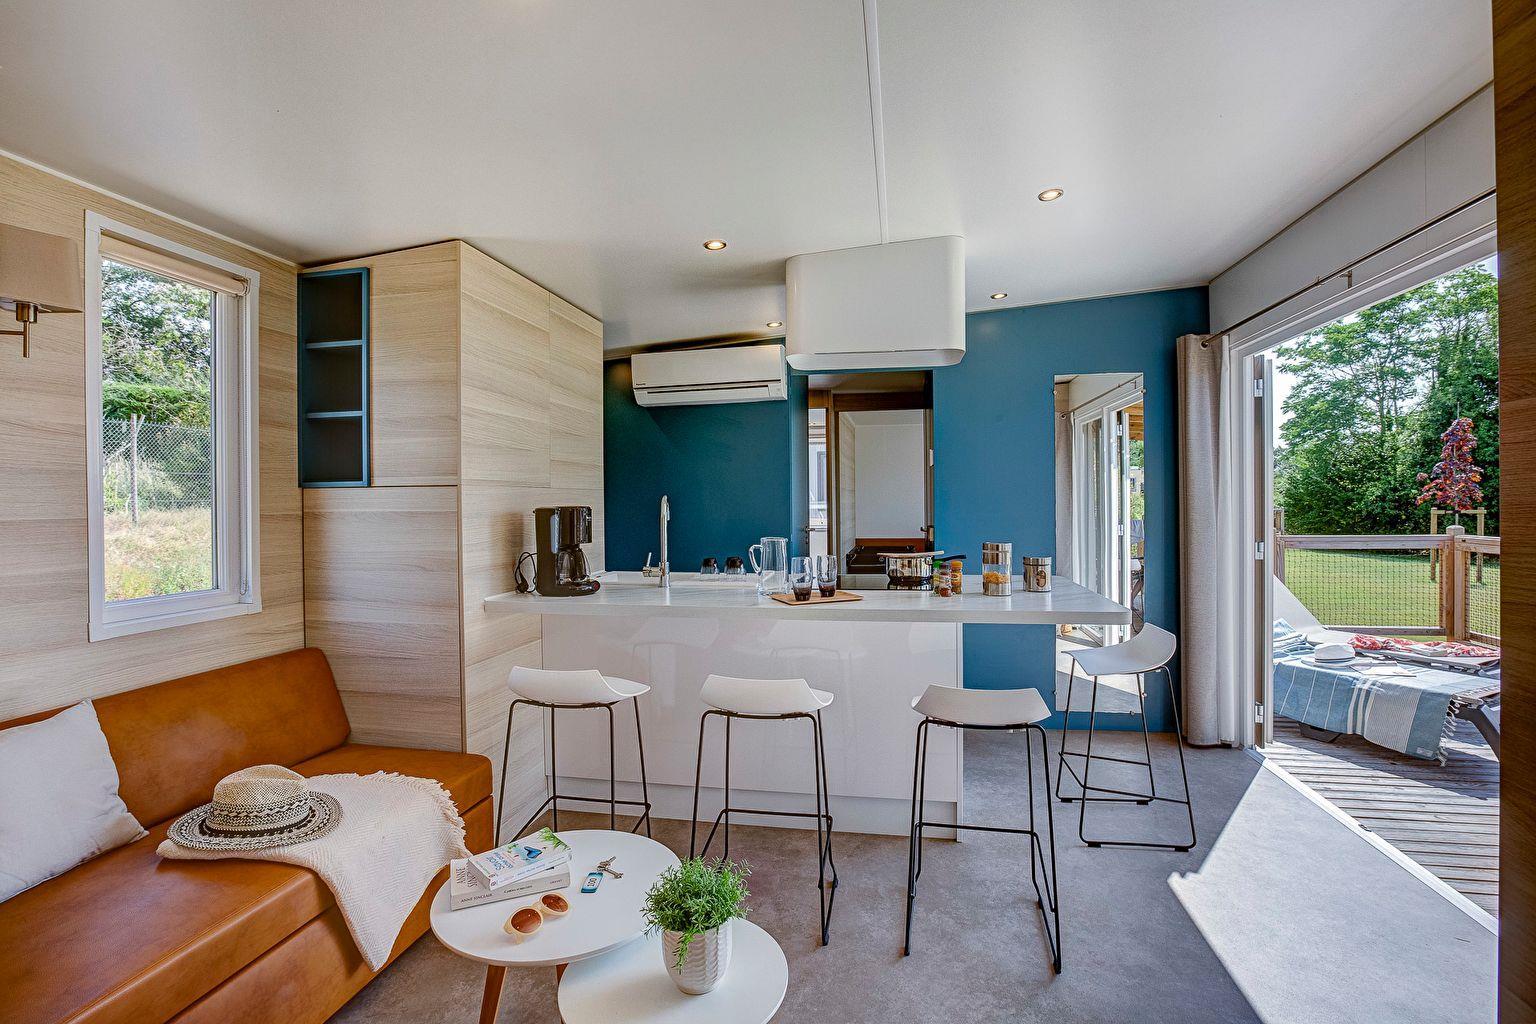 Location - Cottage Key West Family 3 Chambres - 2 Salles De Bain - Climatisation Premium - Camping Sandaya Les Alicourts Resort